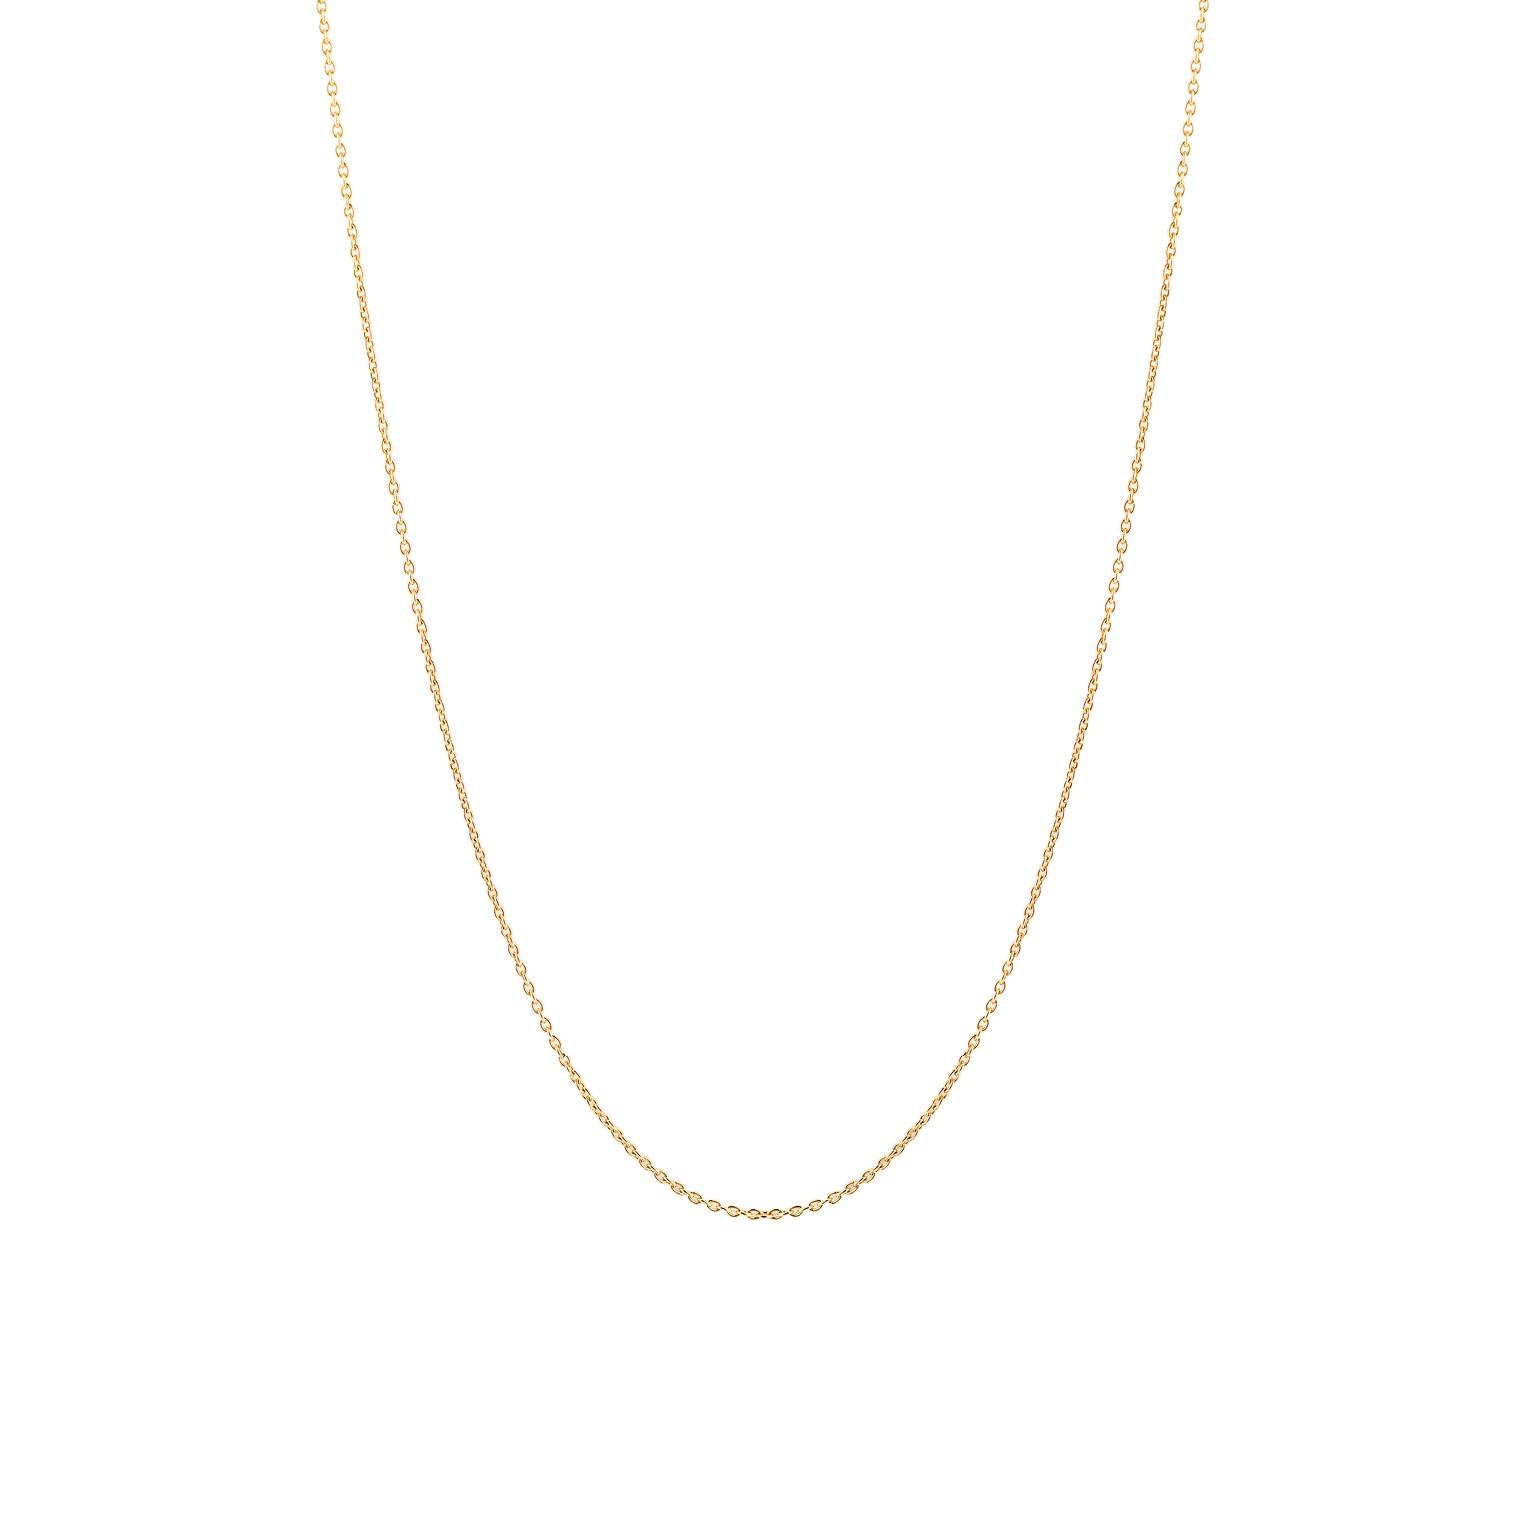 TI SENTO - Milano Collier 3933SY Zilver gold plated